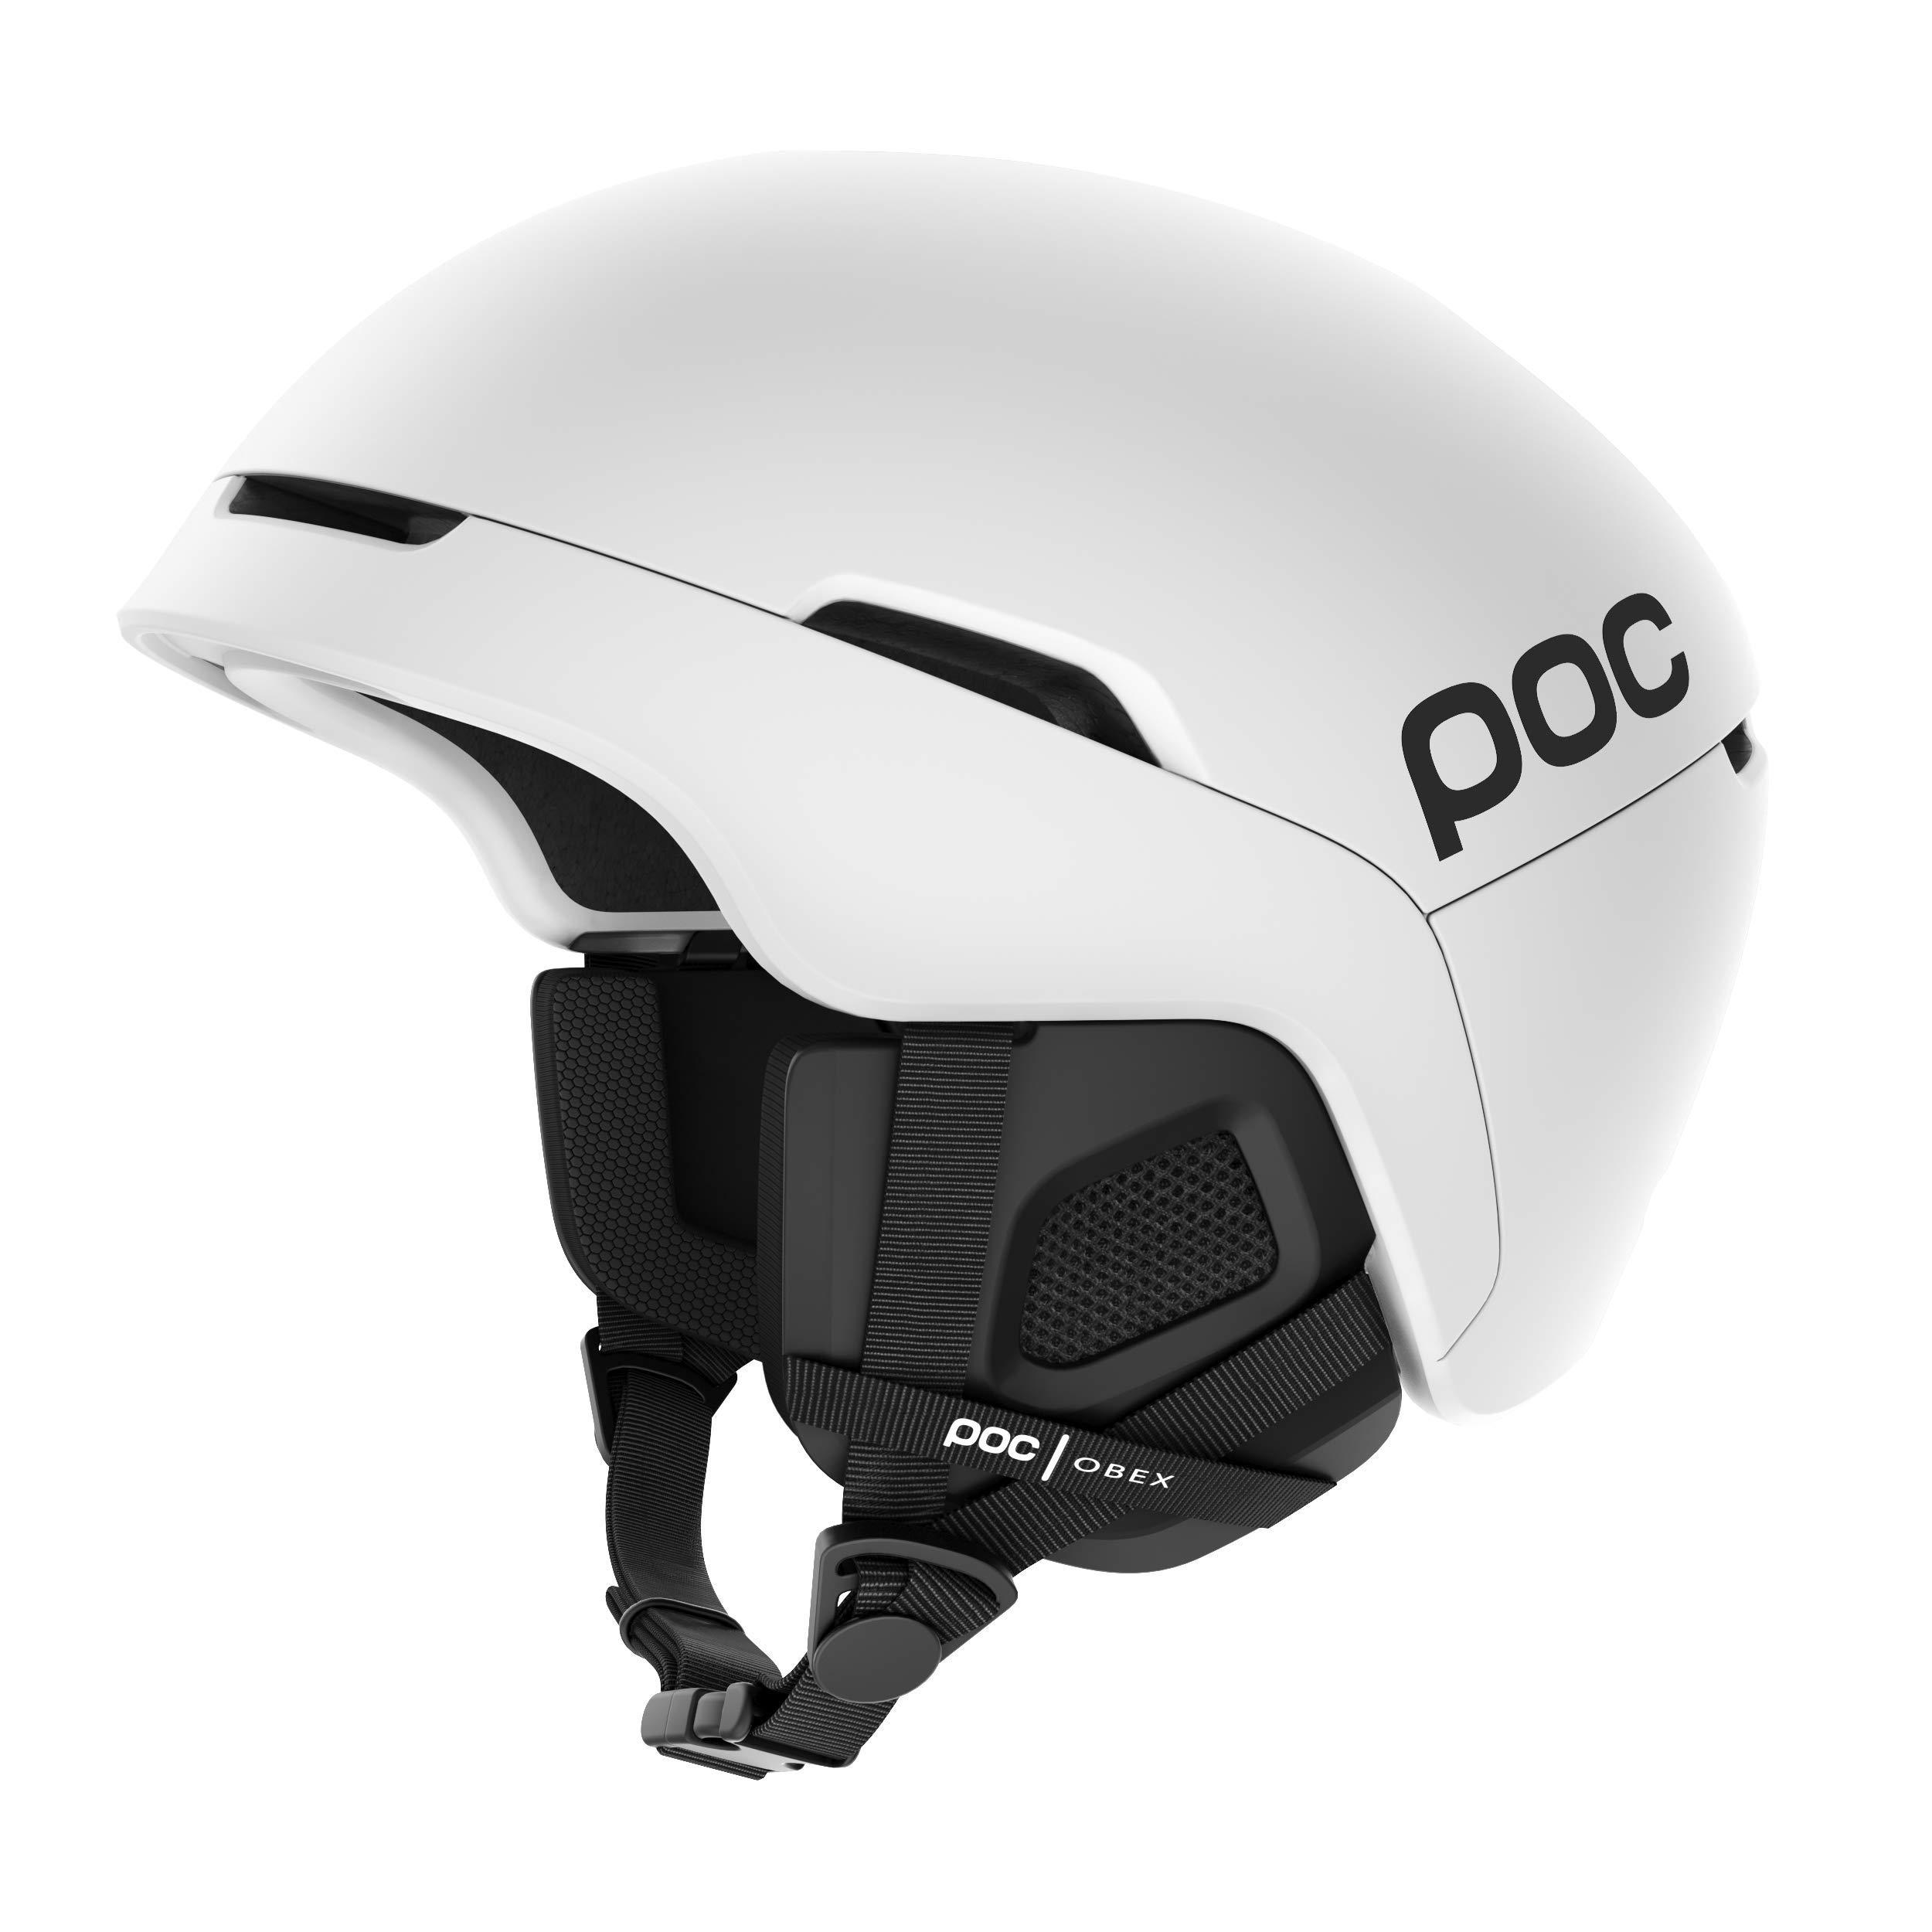 POC Obex SPIN Communication Hydrogen White XSS & Knit Cap Bundle